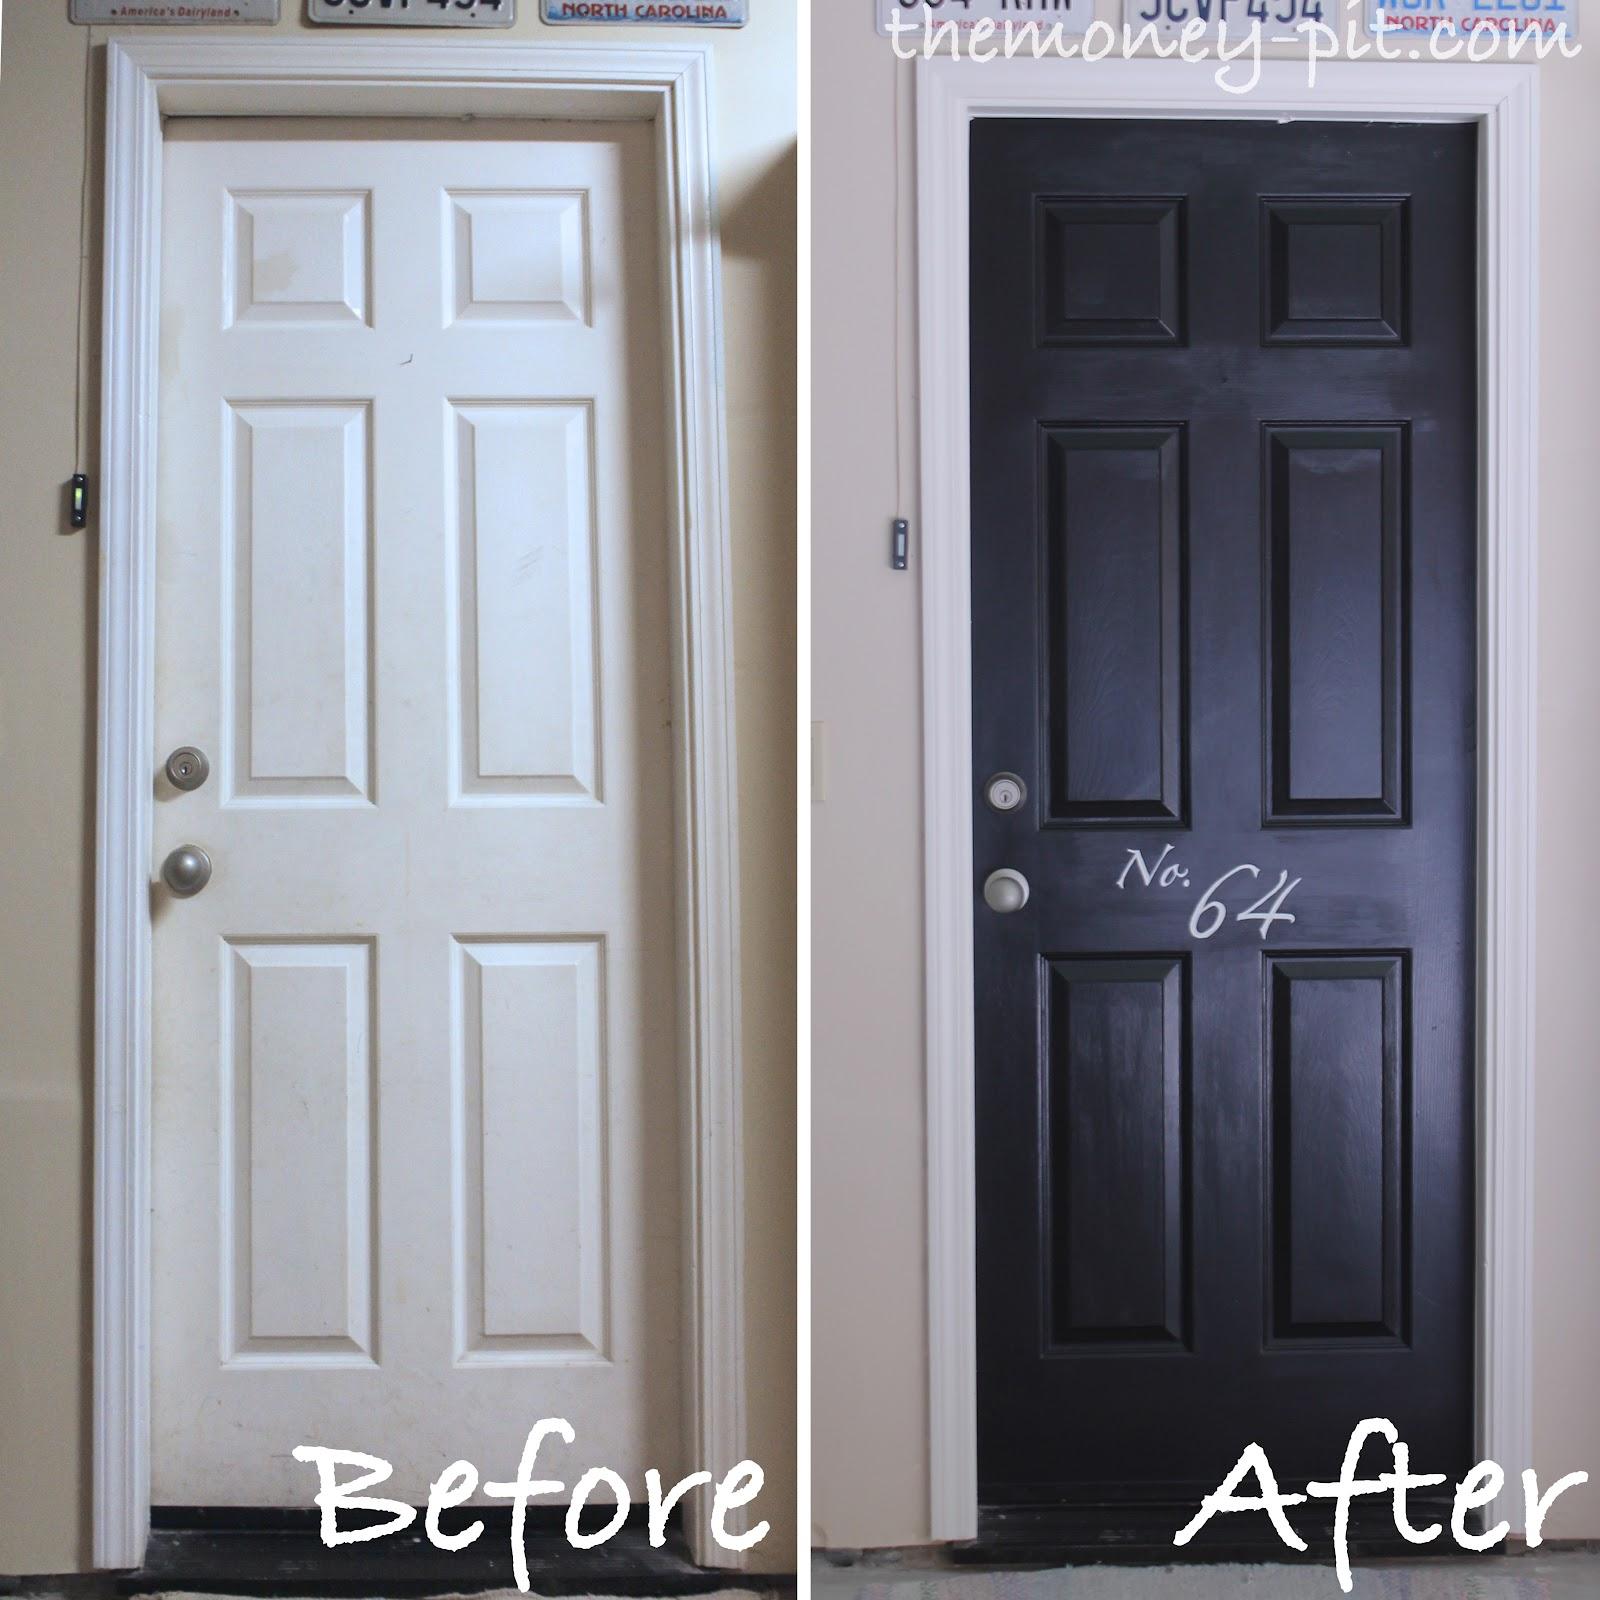 Your garage door should be beautiful too the kim six fix your garage door should be beautiful too rubansaba